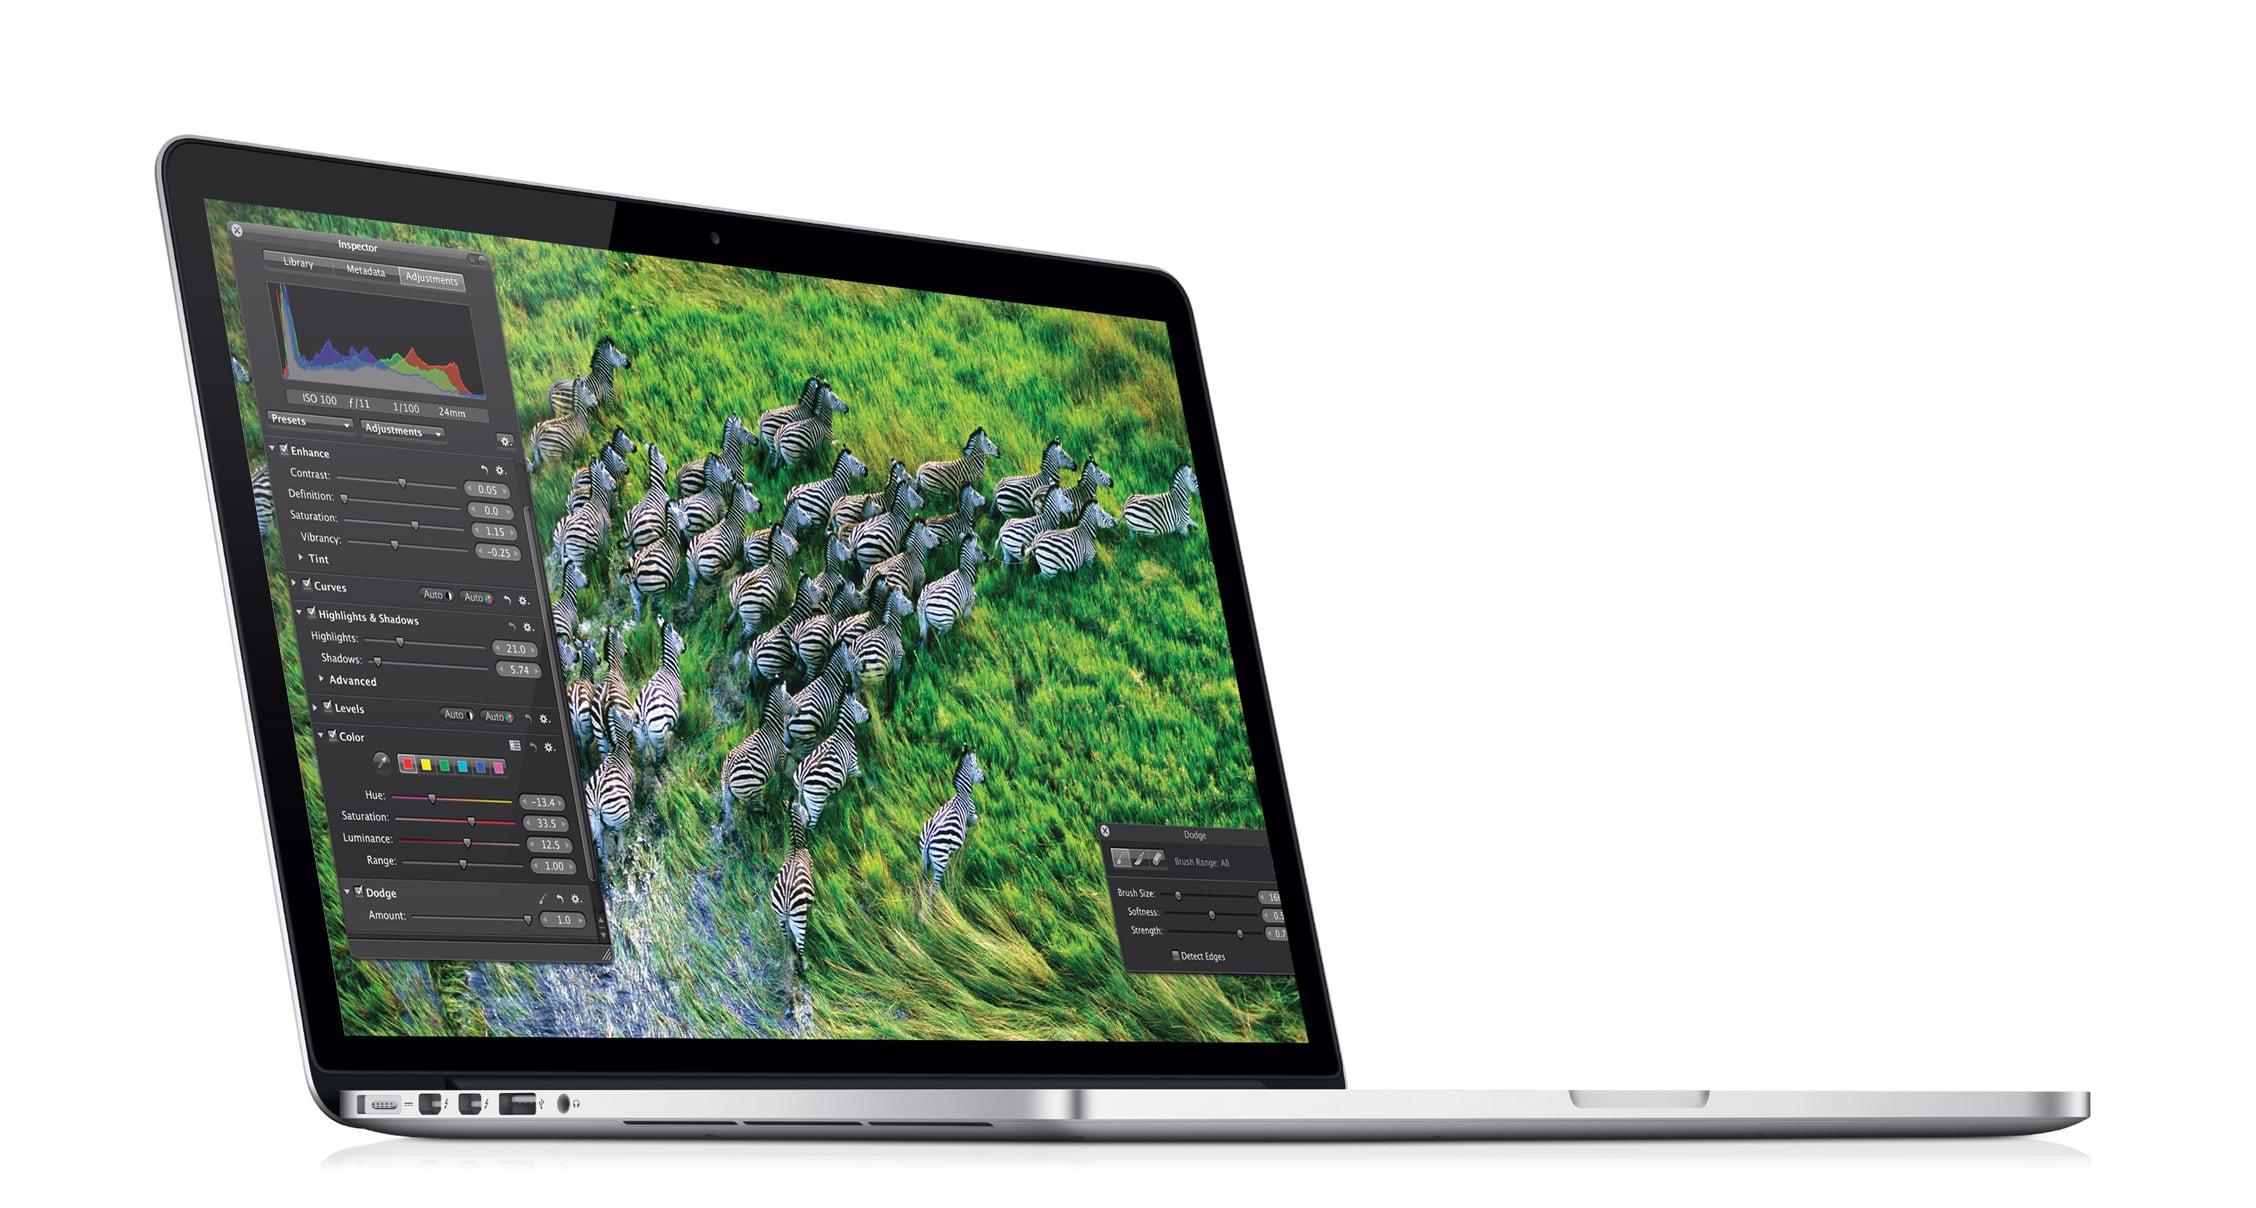 Apple renouvelle ses MacBook Pro Retina avec la plateforme Intel Haswell